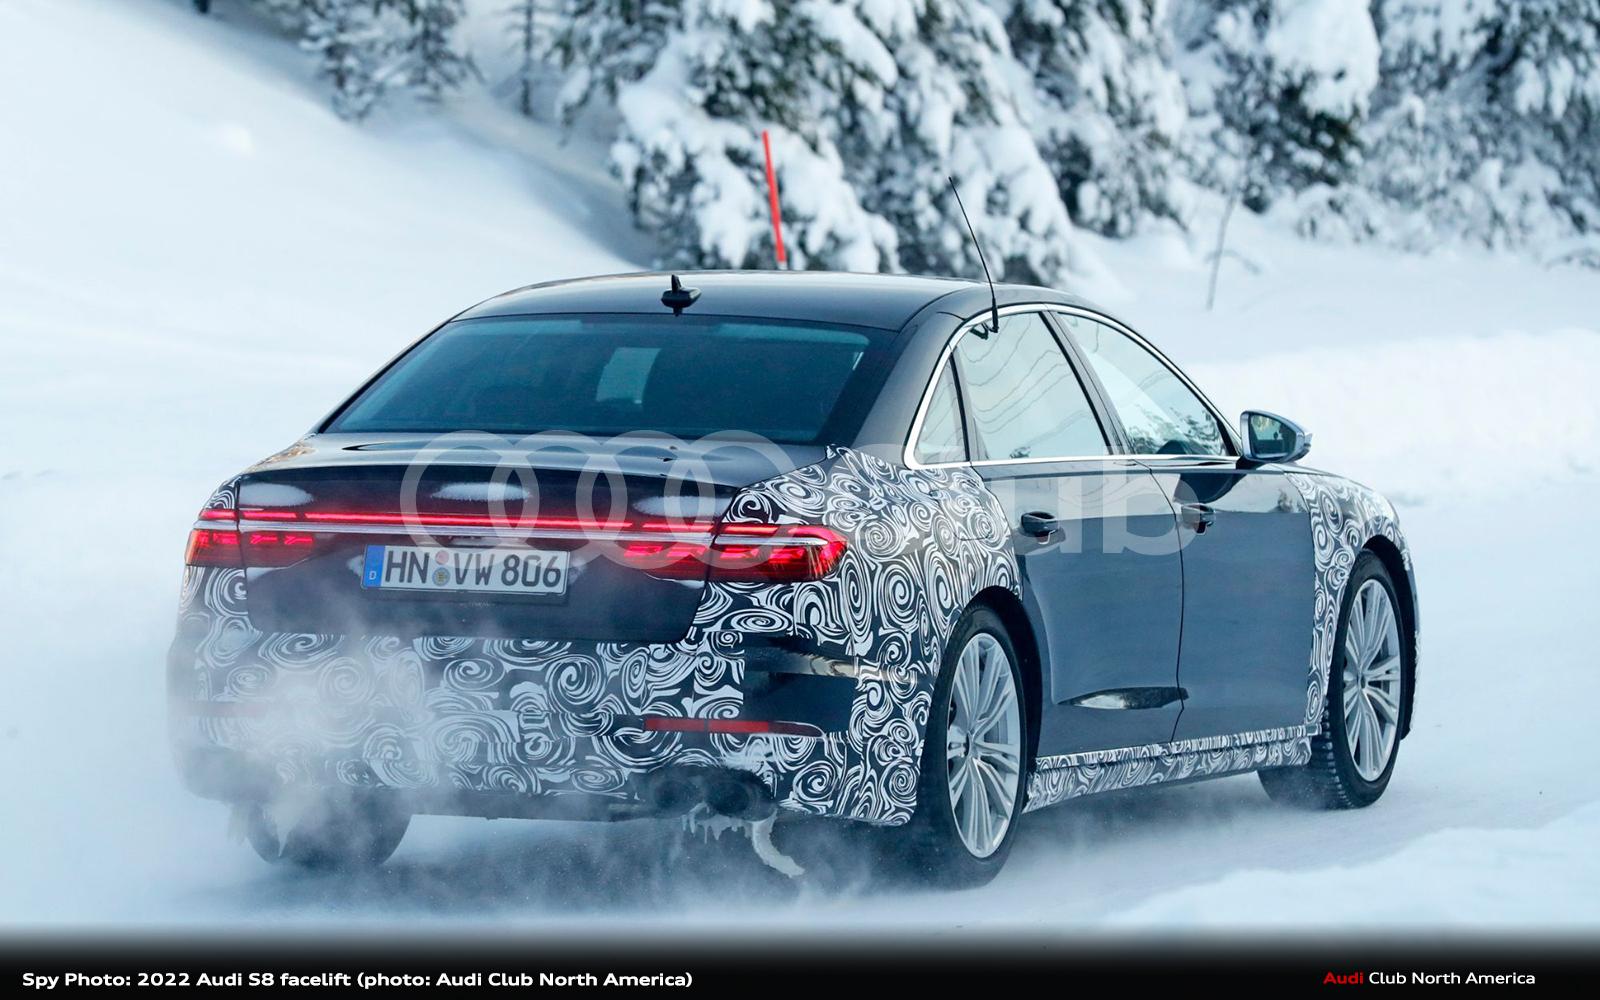 Spy Photo: 2022 Audi S8 Facelift